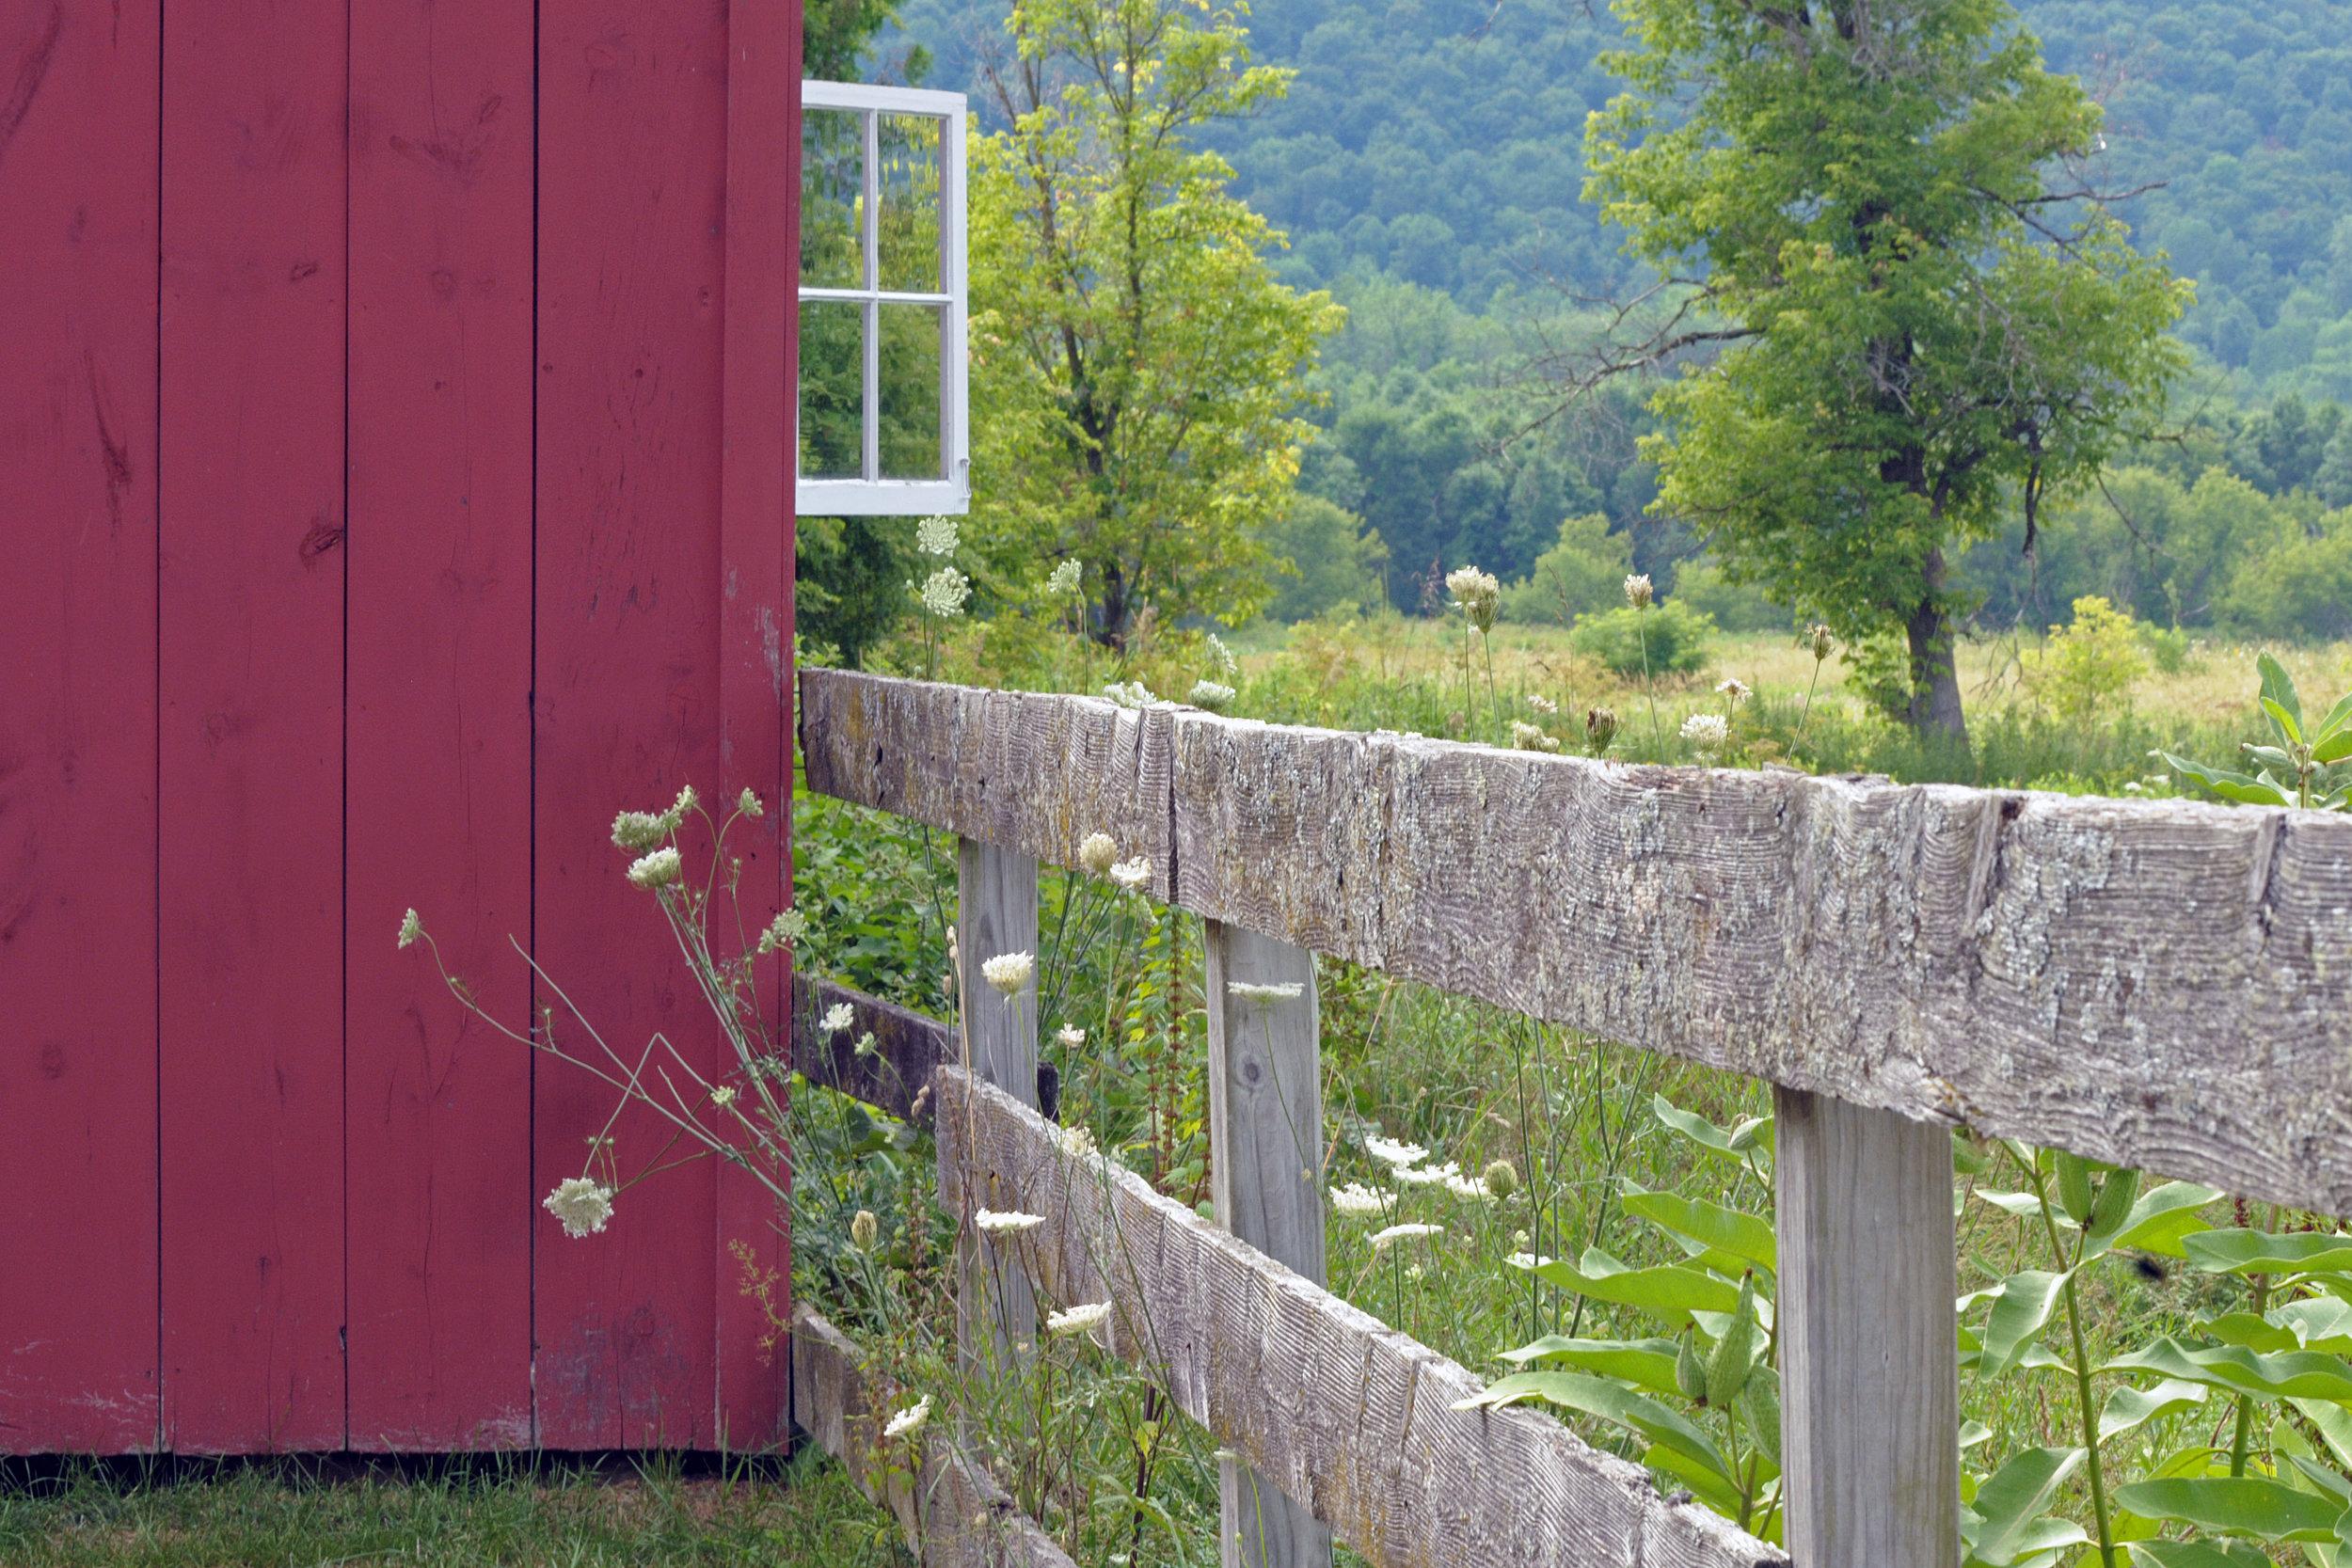 Fence and Barn Window 3_4171.jpg